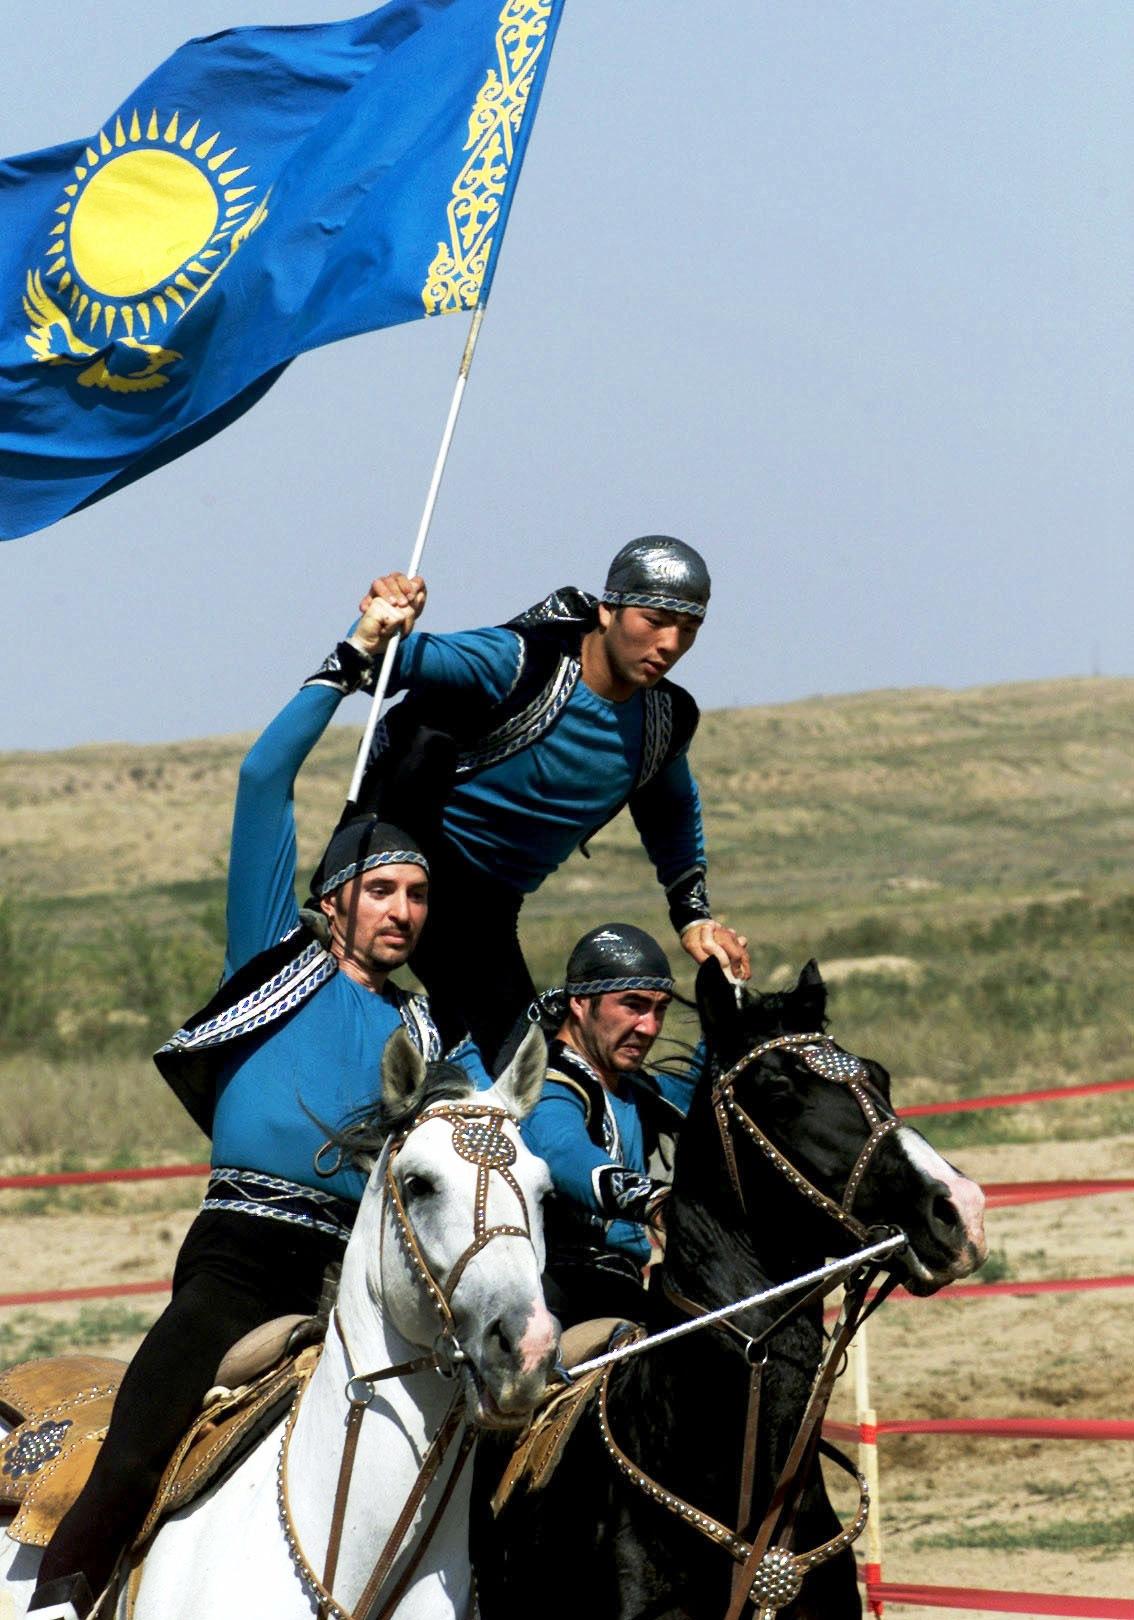 sport in kazakhstan реферат на английском